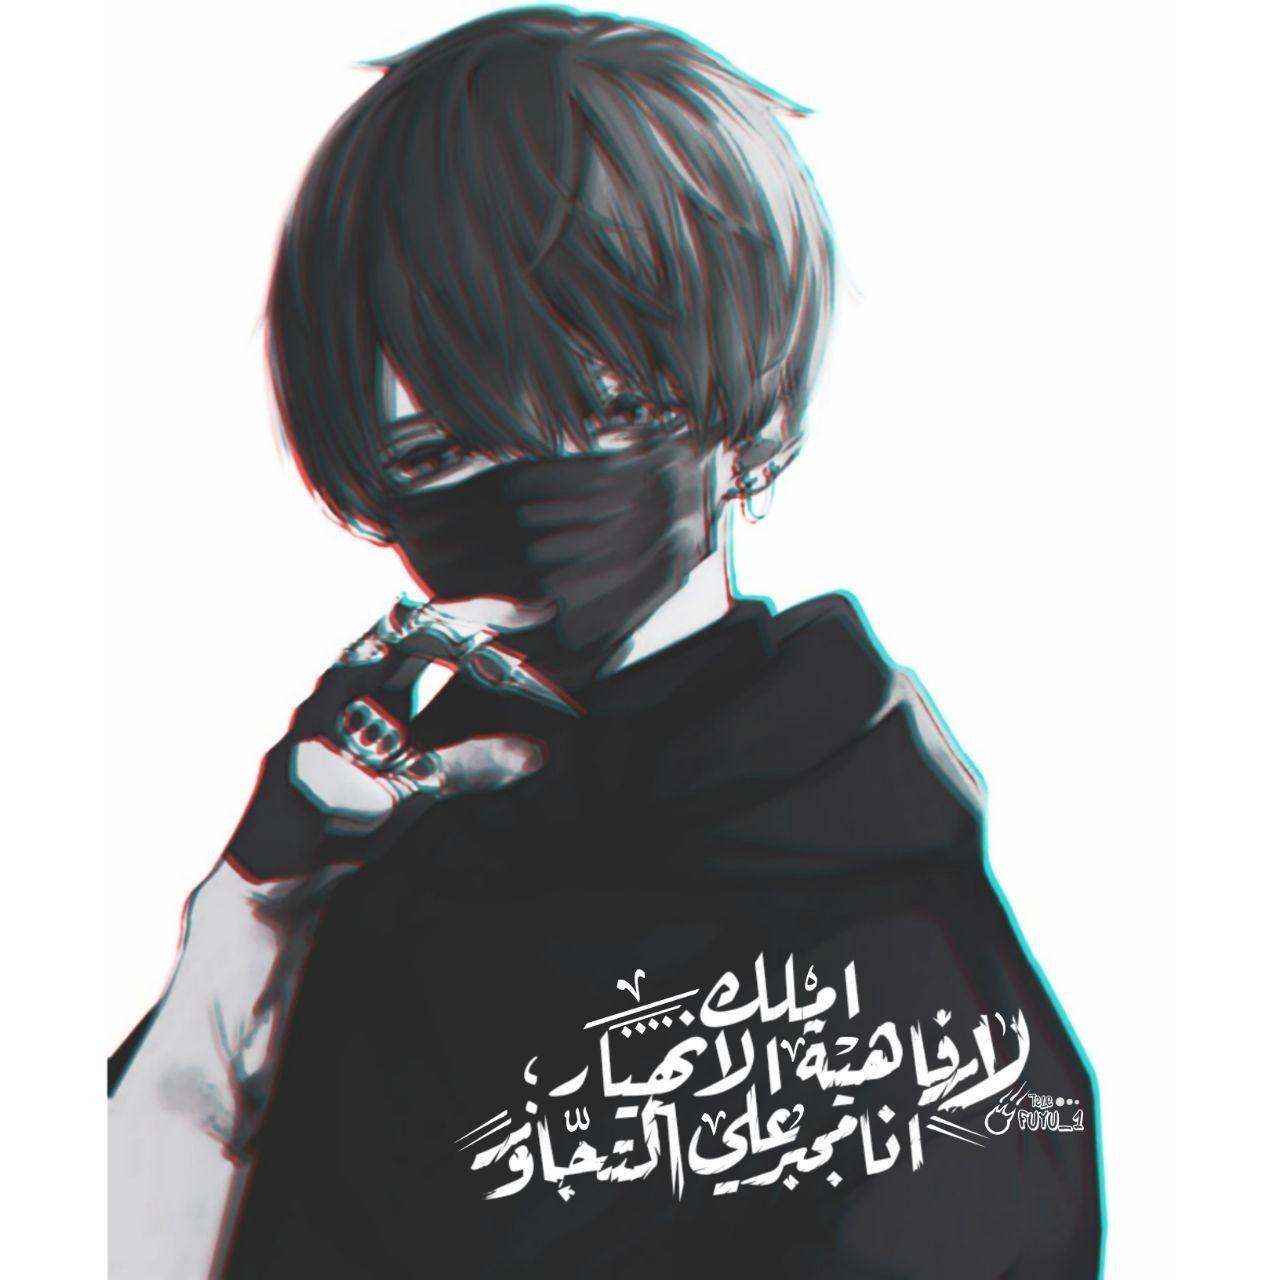 رمزيات انمي Telegram Fuyu 1 Telegram Odayakana Telegram Animegray Anime Boy Sketch Anime Boy Boy Sketch